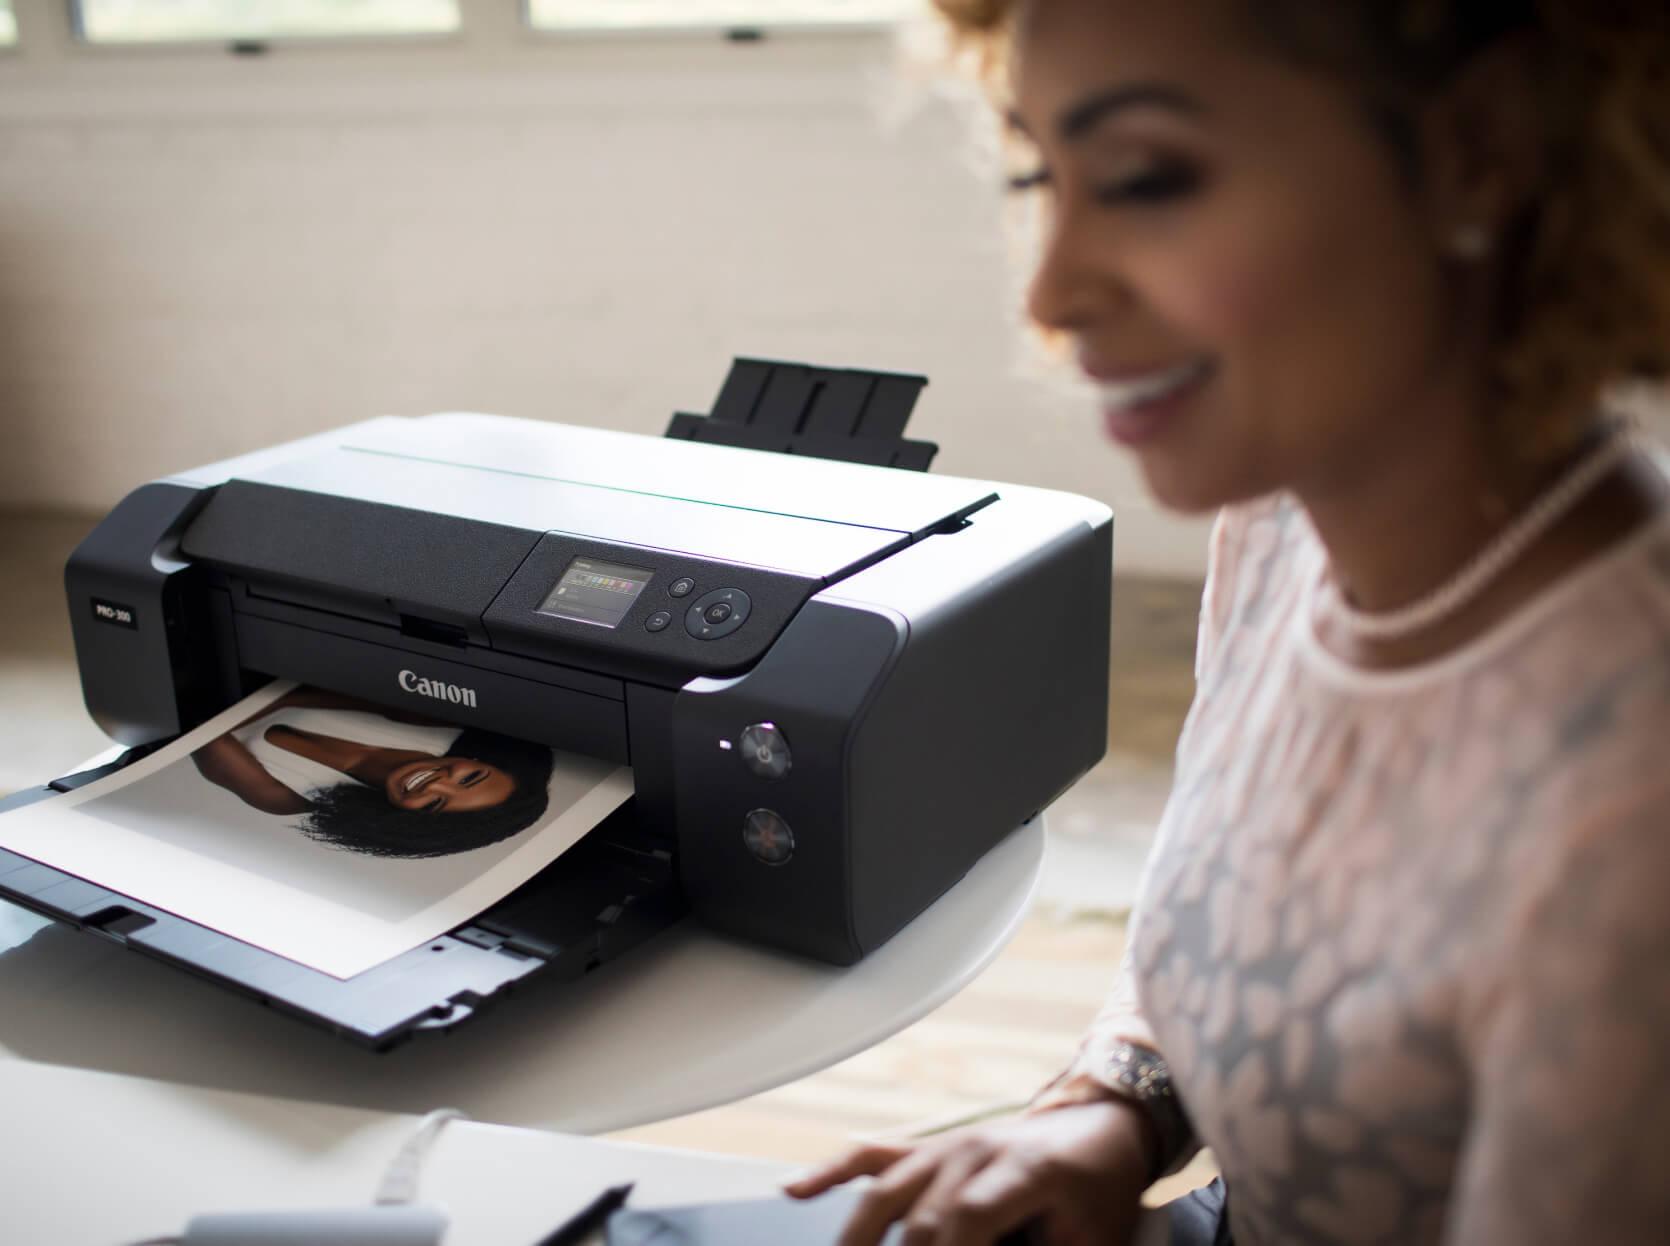 Zsa'nee Gaines printing